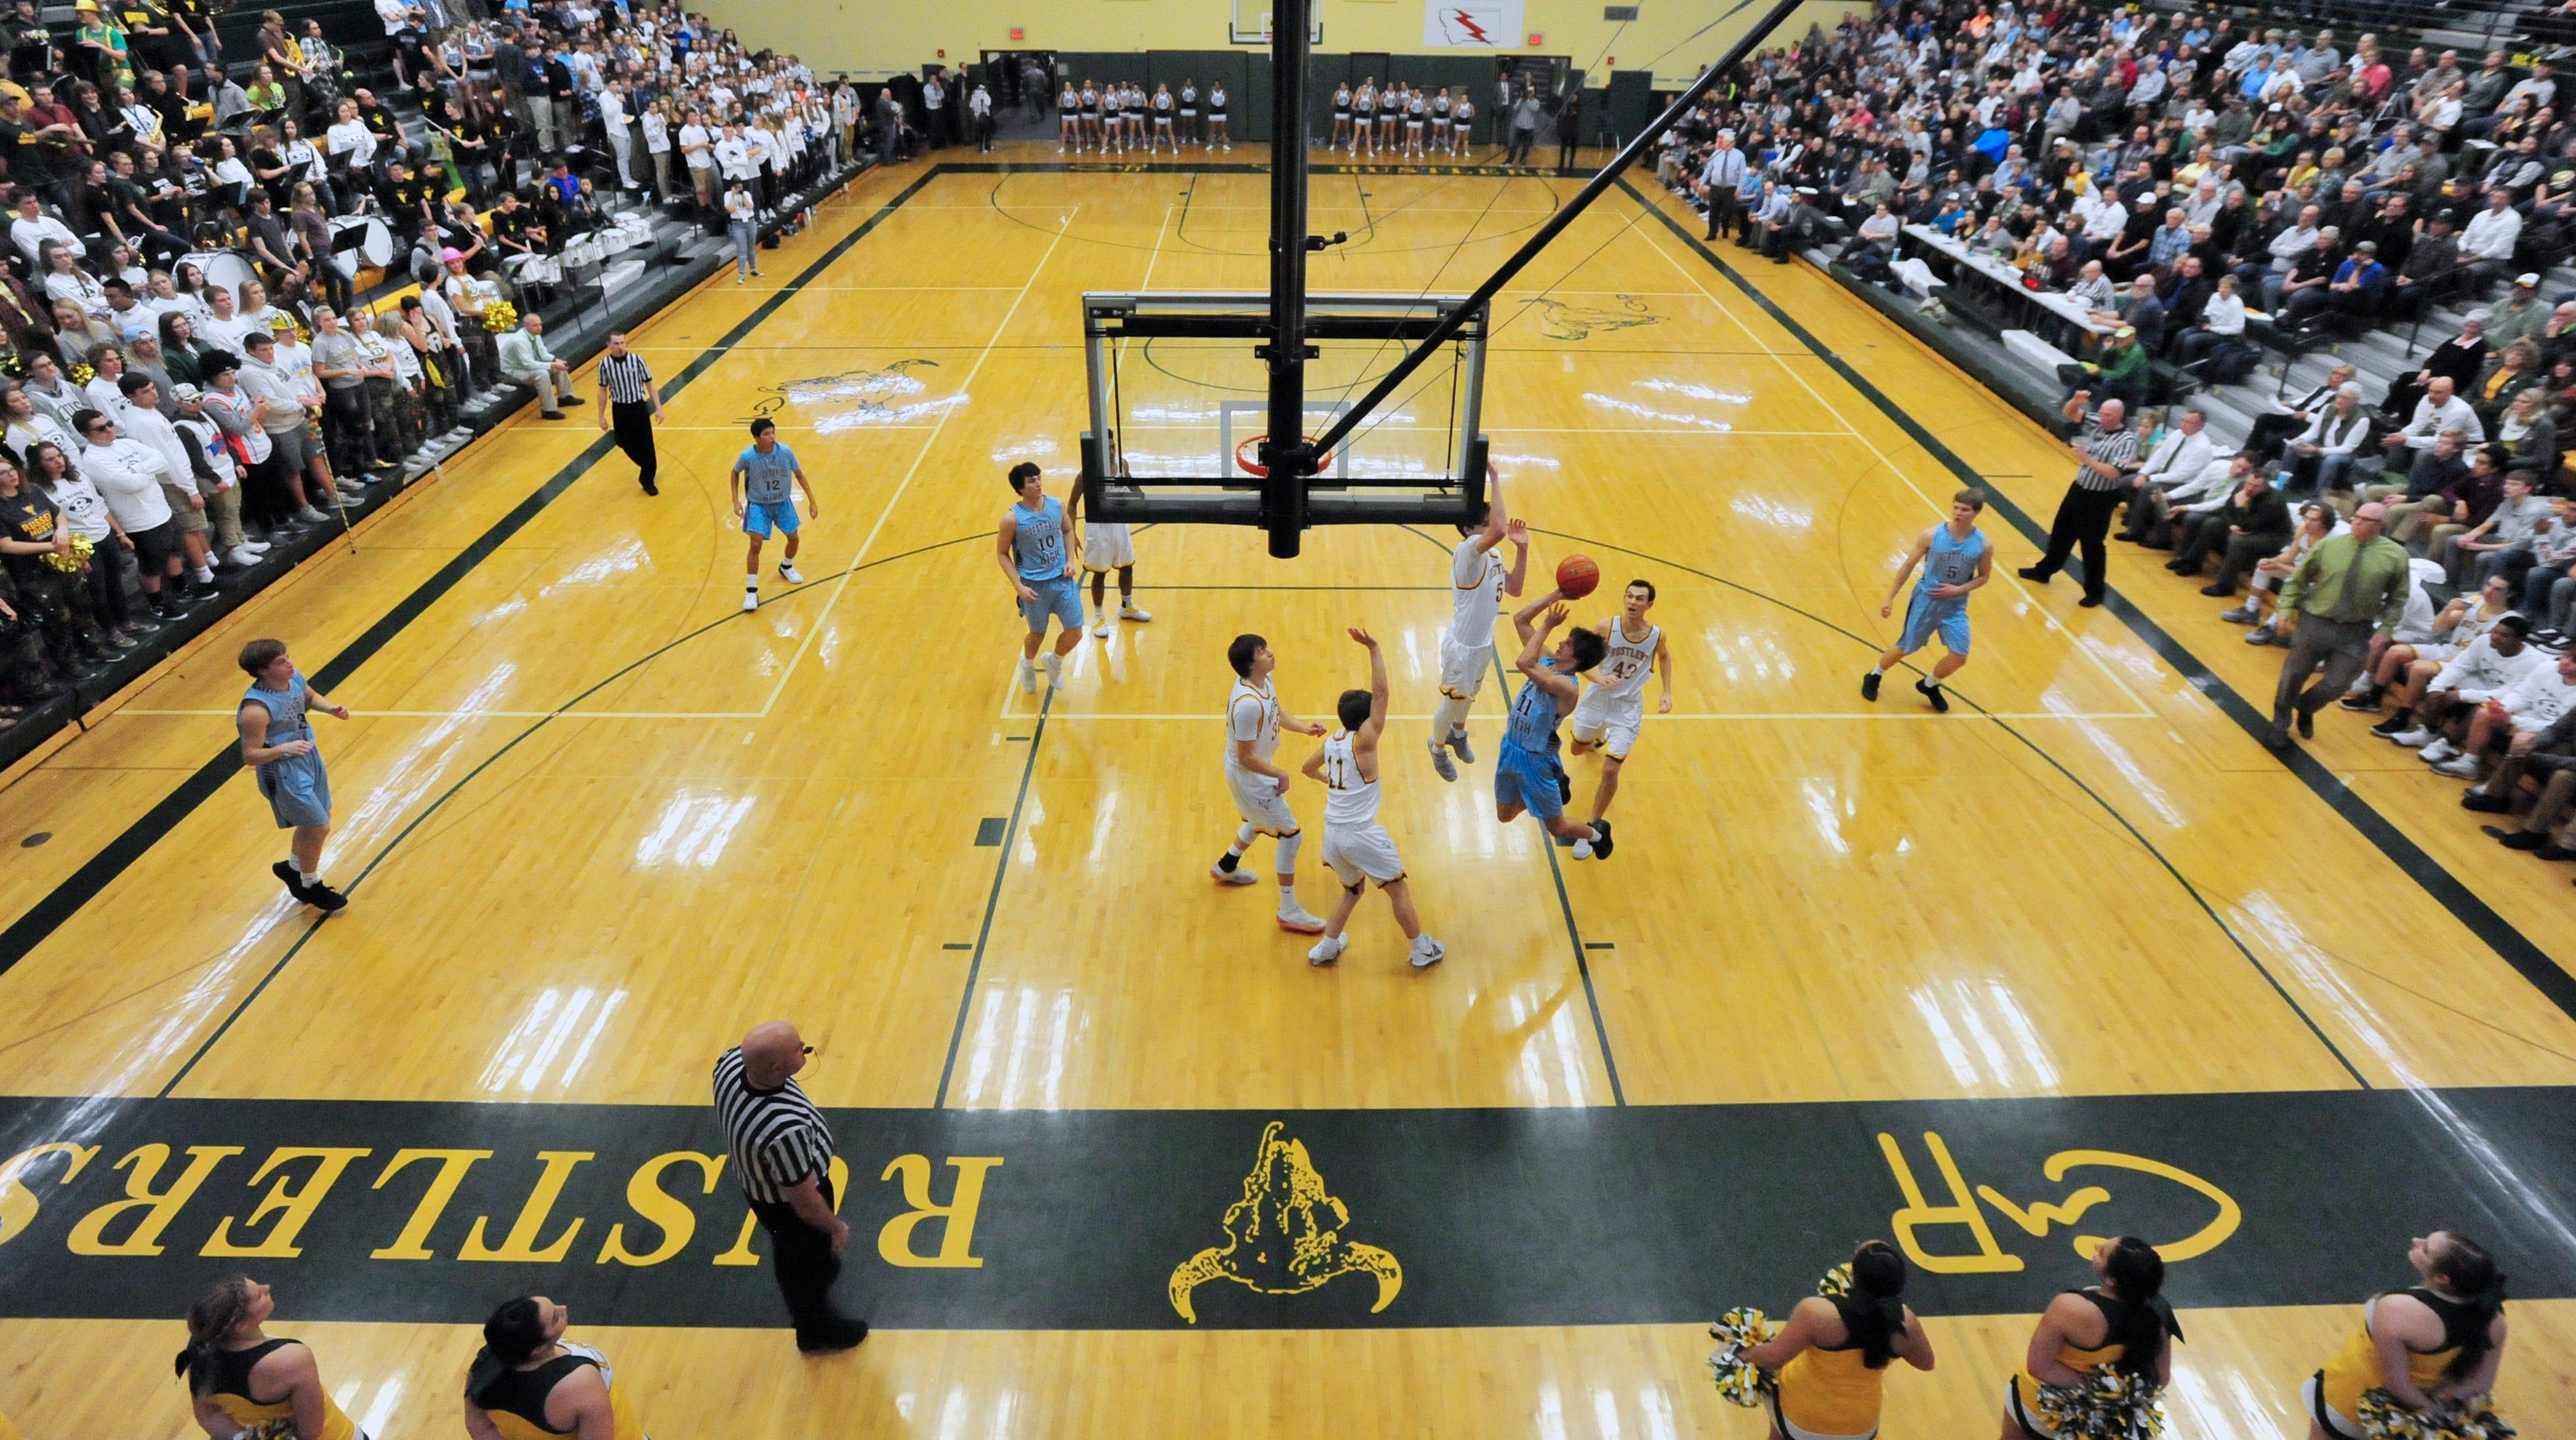 High School basketball information